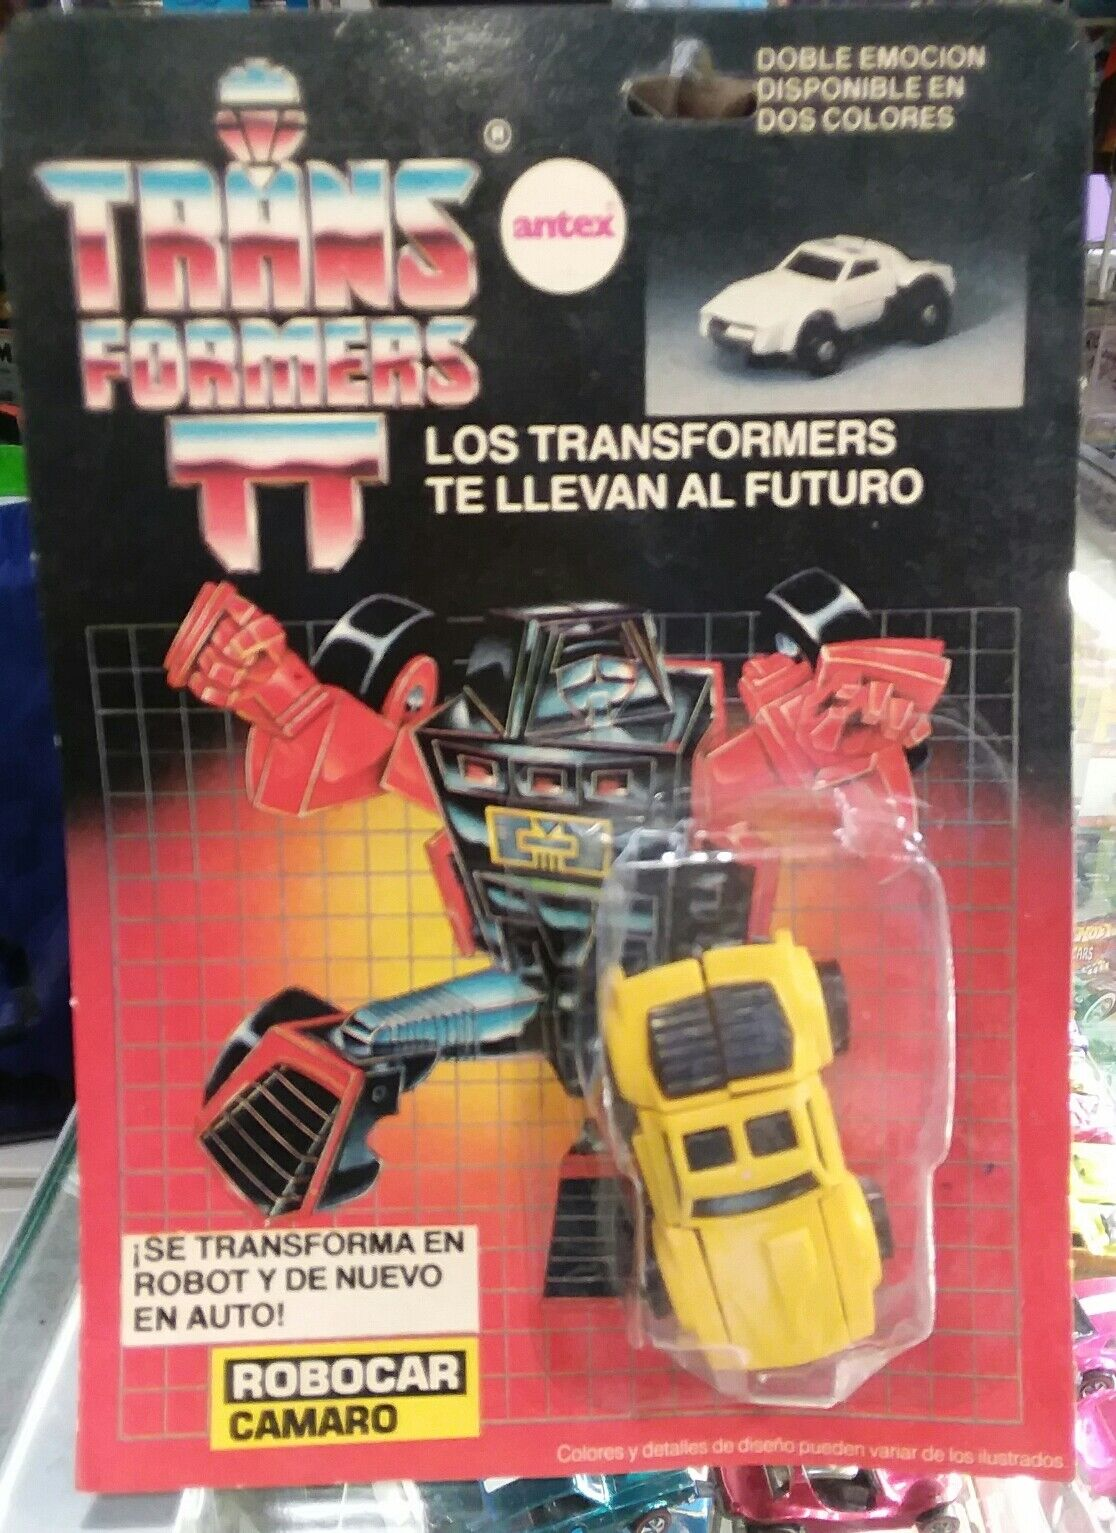 Transformers G1 Antex Robocar Camaro Yellow Windcharger silverina Variant MISBP